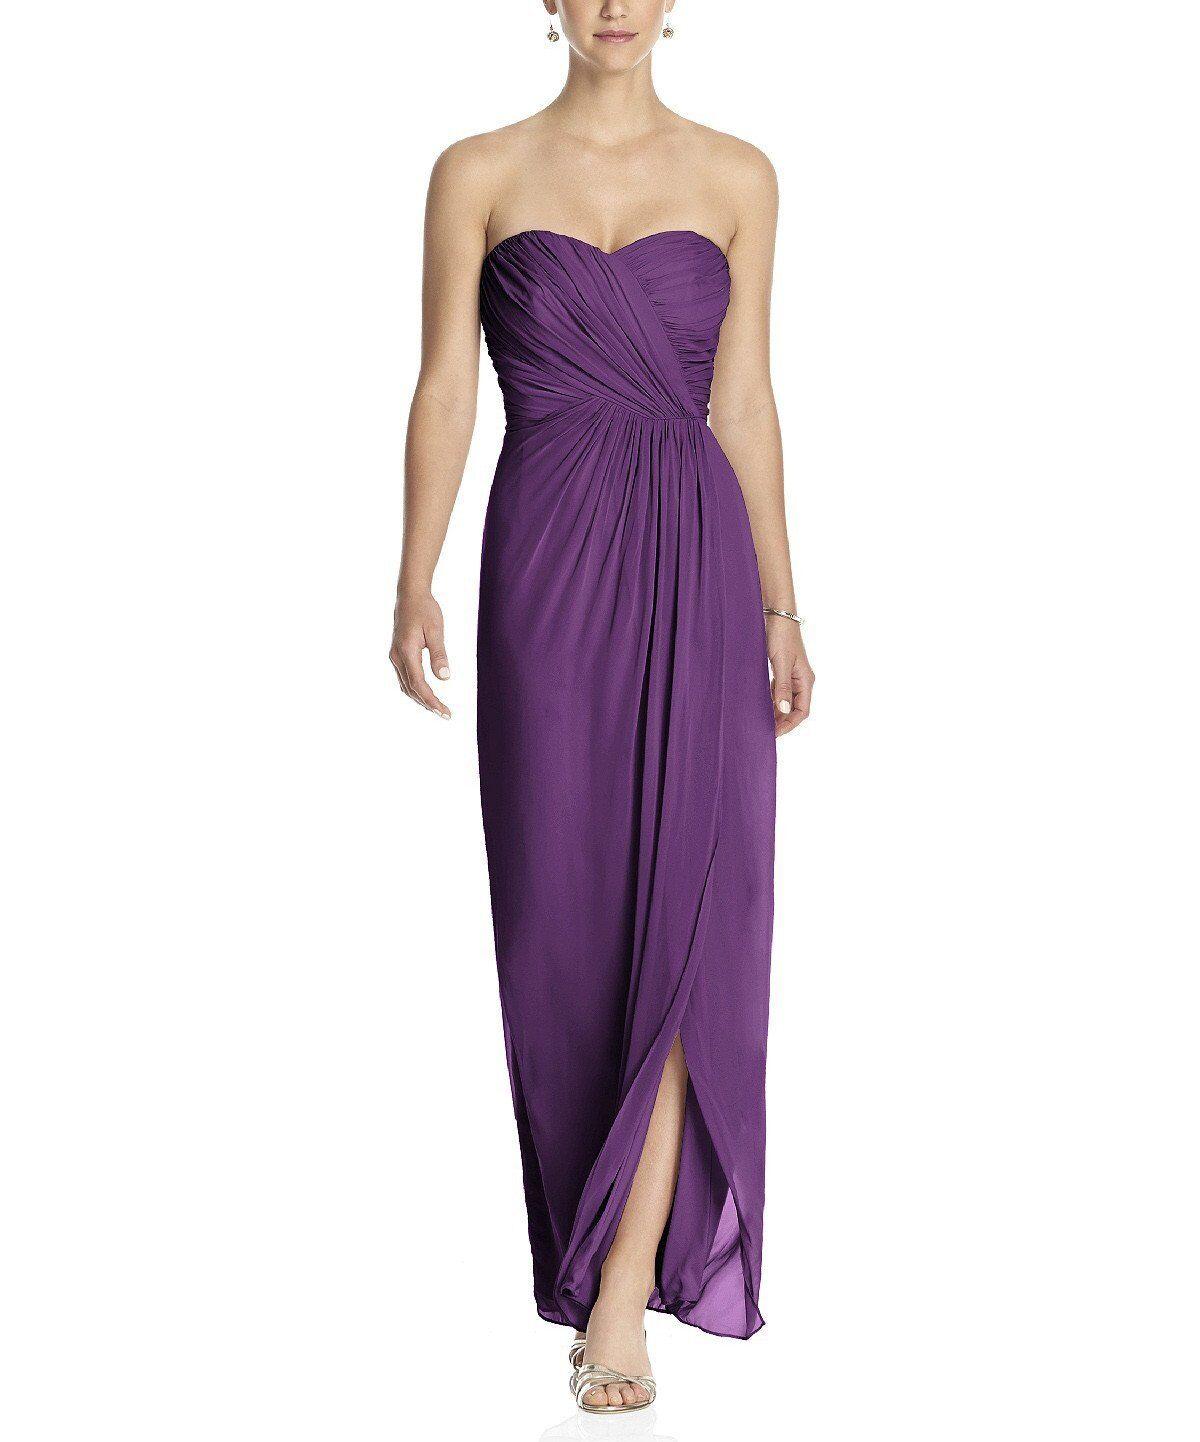 2 Dessy Collection Vivian Diamond Size 2 Prom Homecoming Bridesmaid Dress Auberg